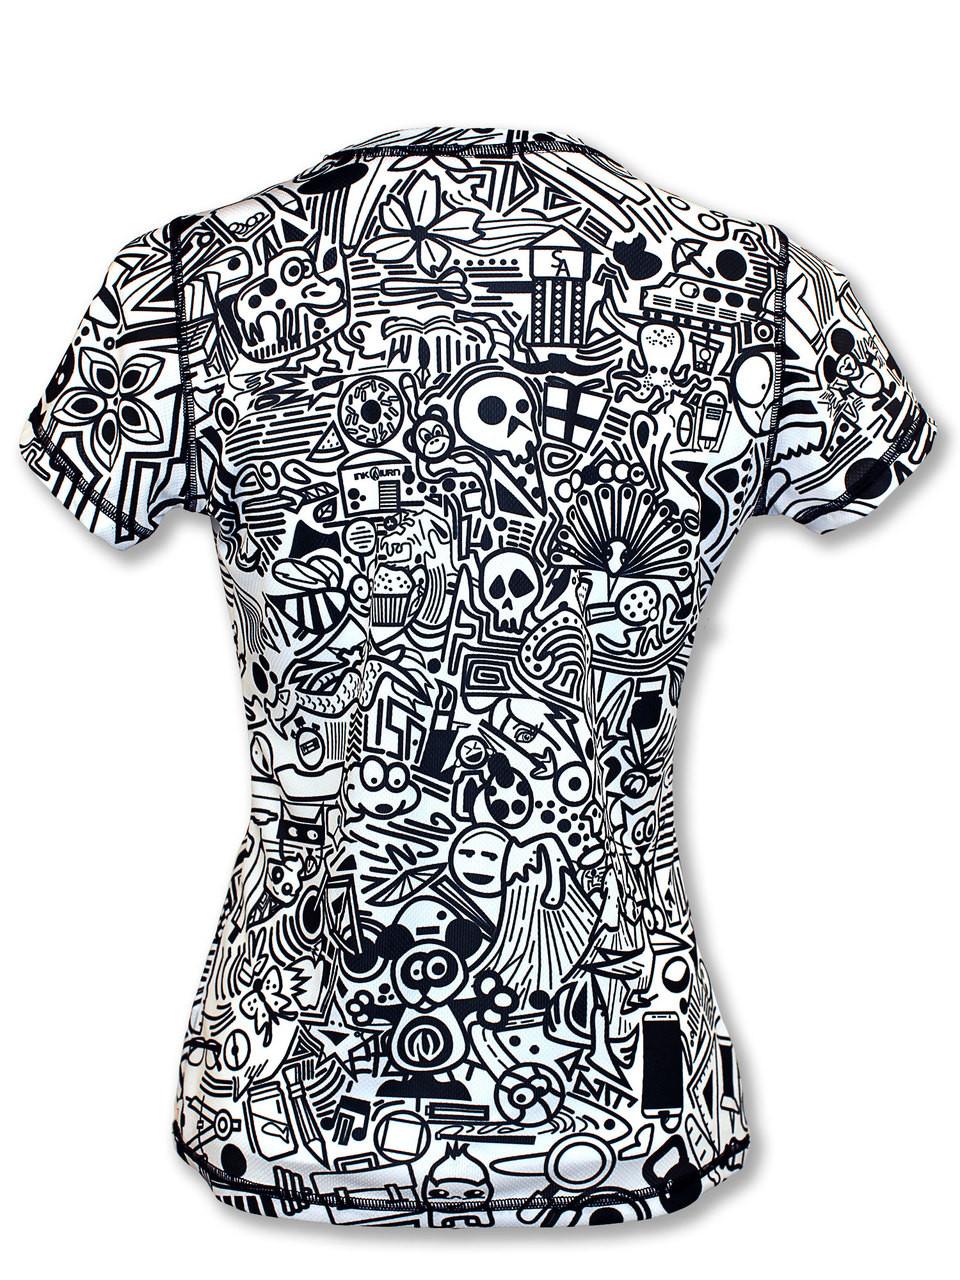 INKnBURN Women's Hidden Meanings Tech Shirt Back